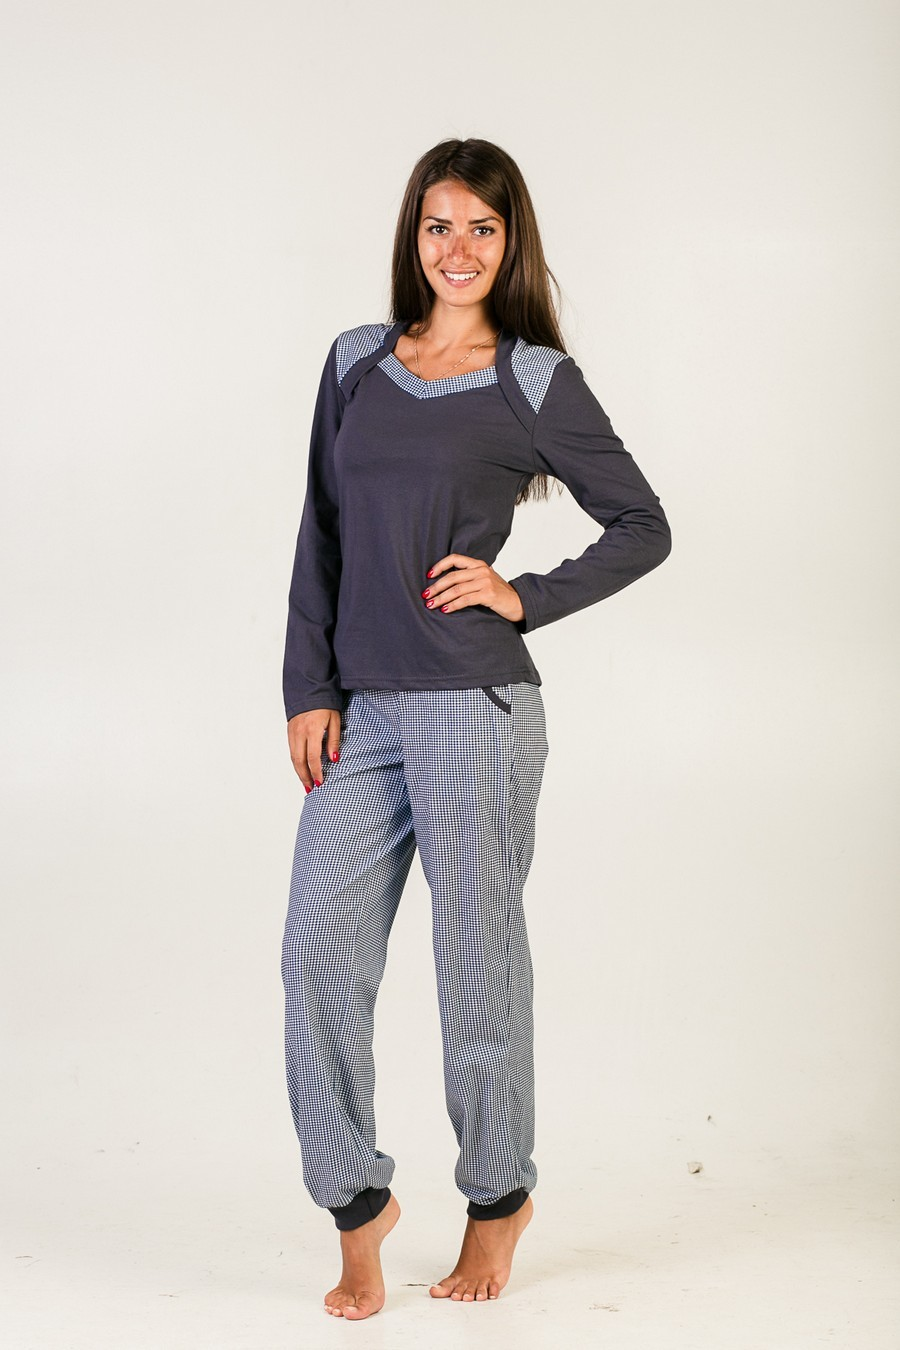 Комплект Меланж Клетка (блузка+брюки)Домашние комплекты, костюмы<br><br><br>Размер: 48